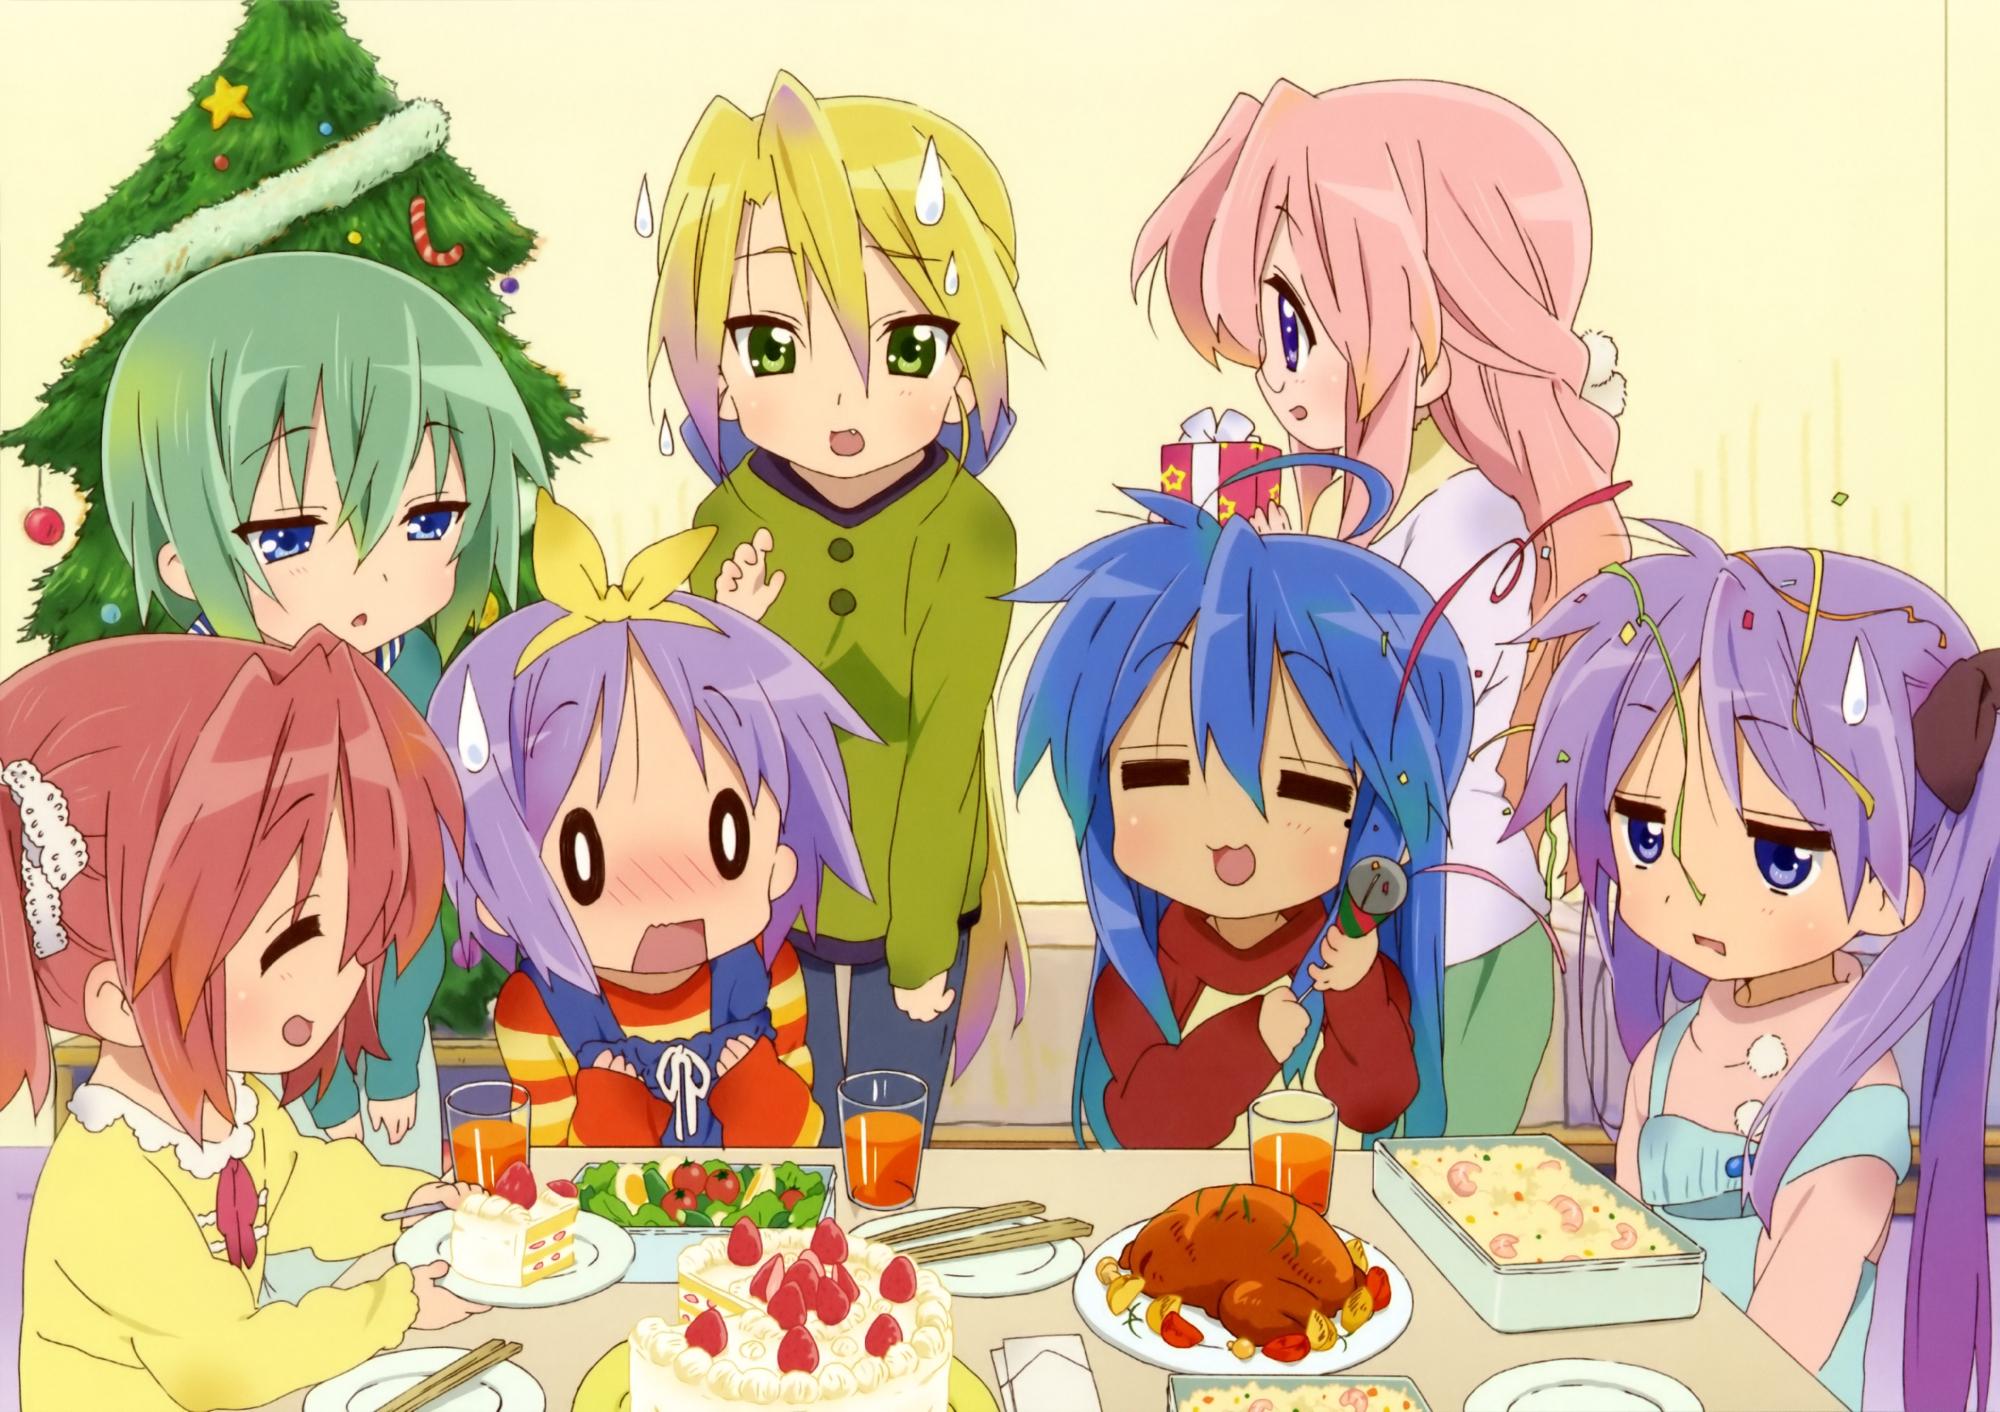 christmas food hiiragi_kagami hiiragi_tsukasa iwasaki_minami izumi_konata kobayakawa_yutaka lucky_star scan takara_miyuki